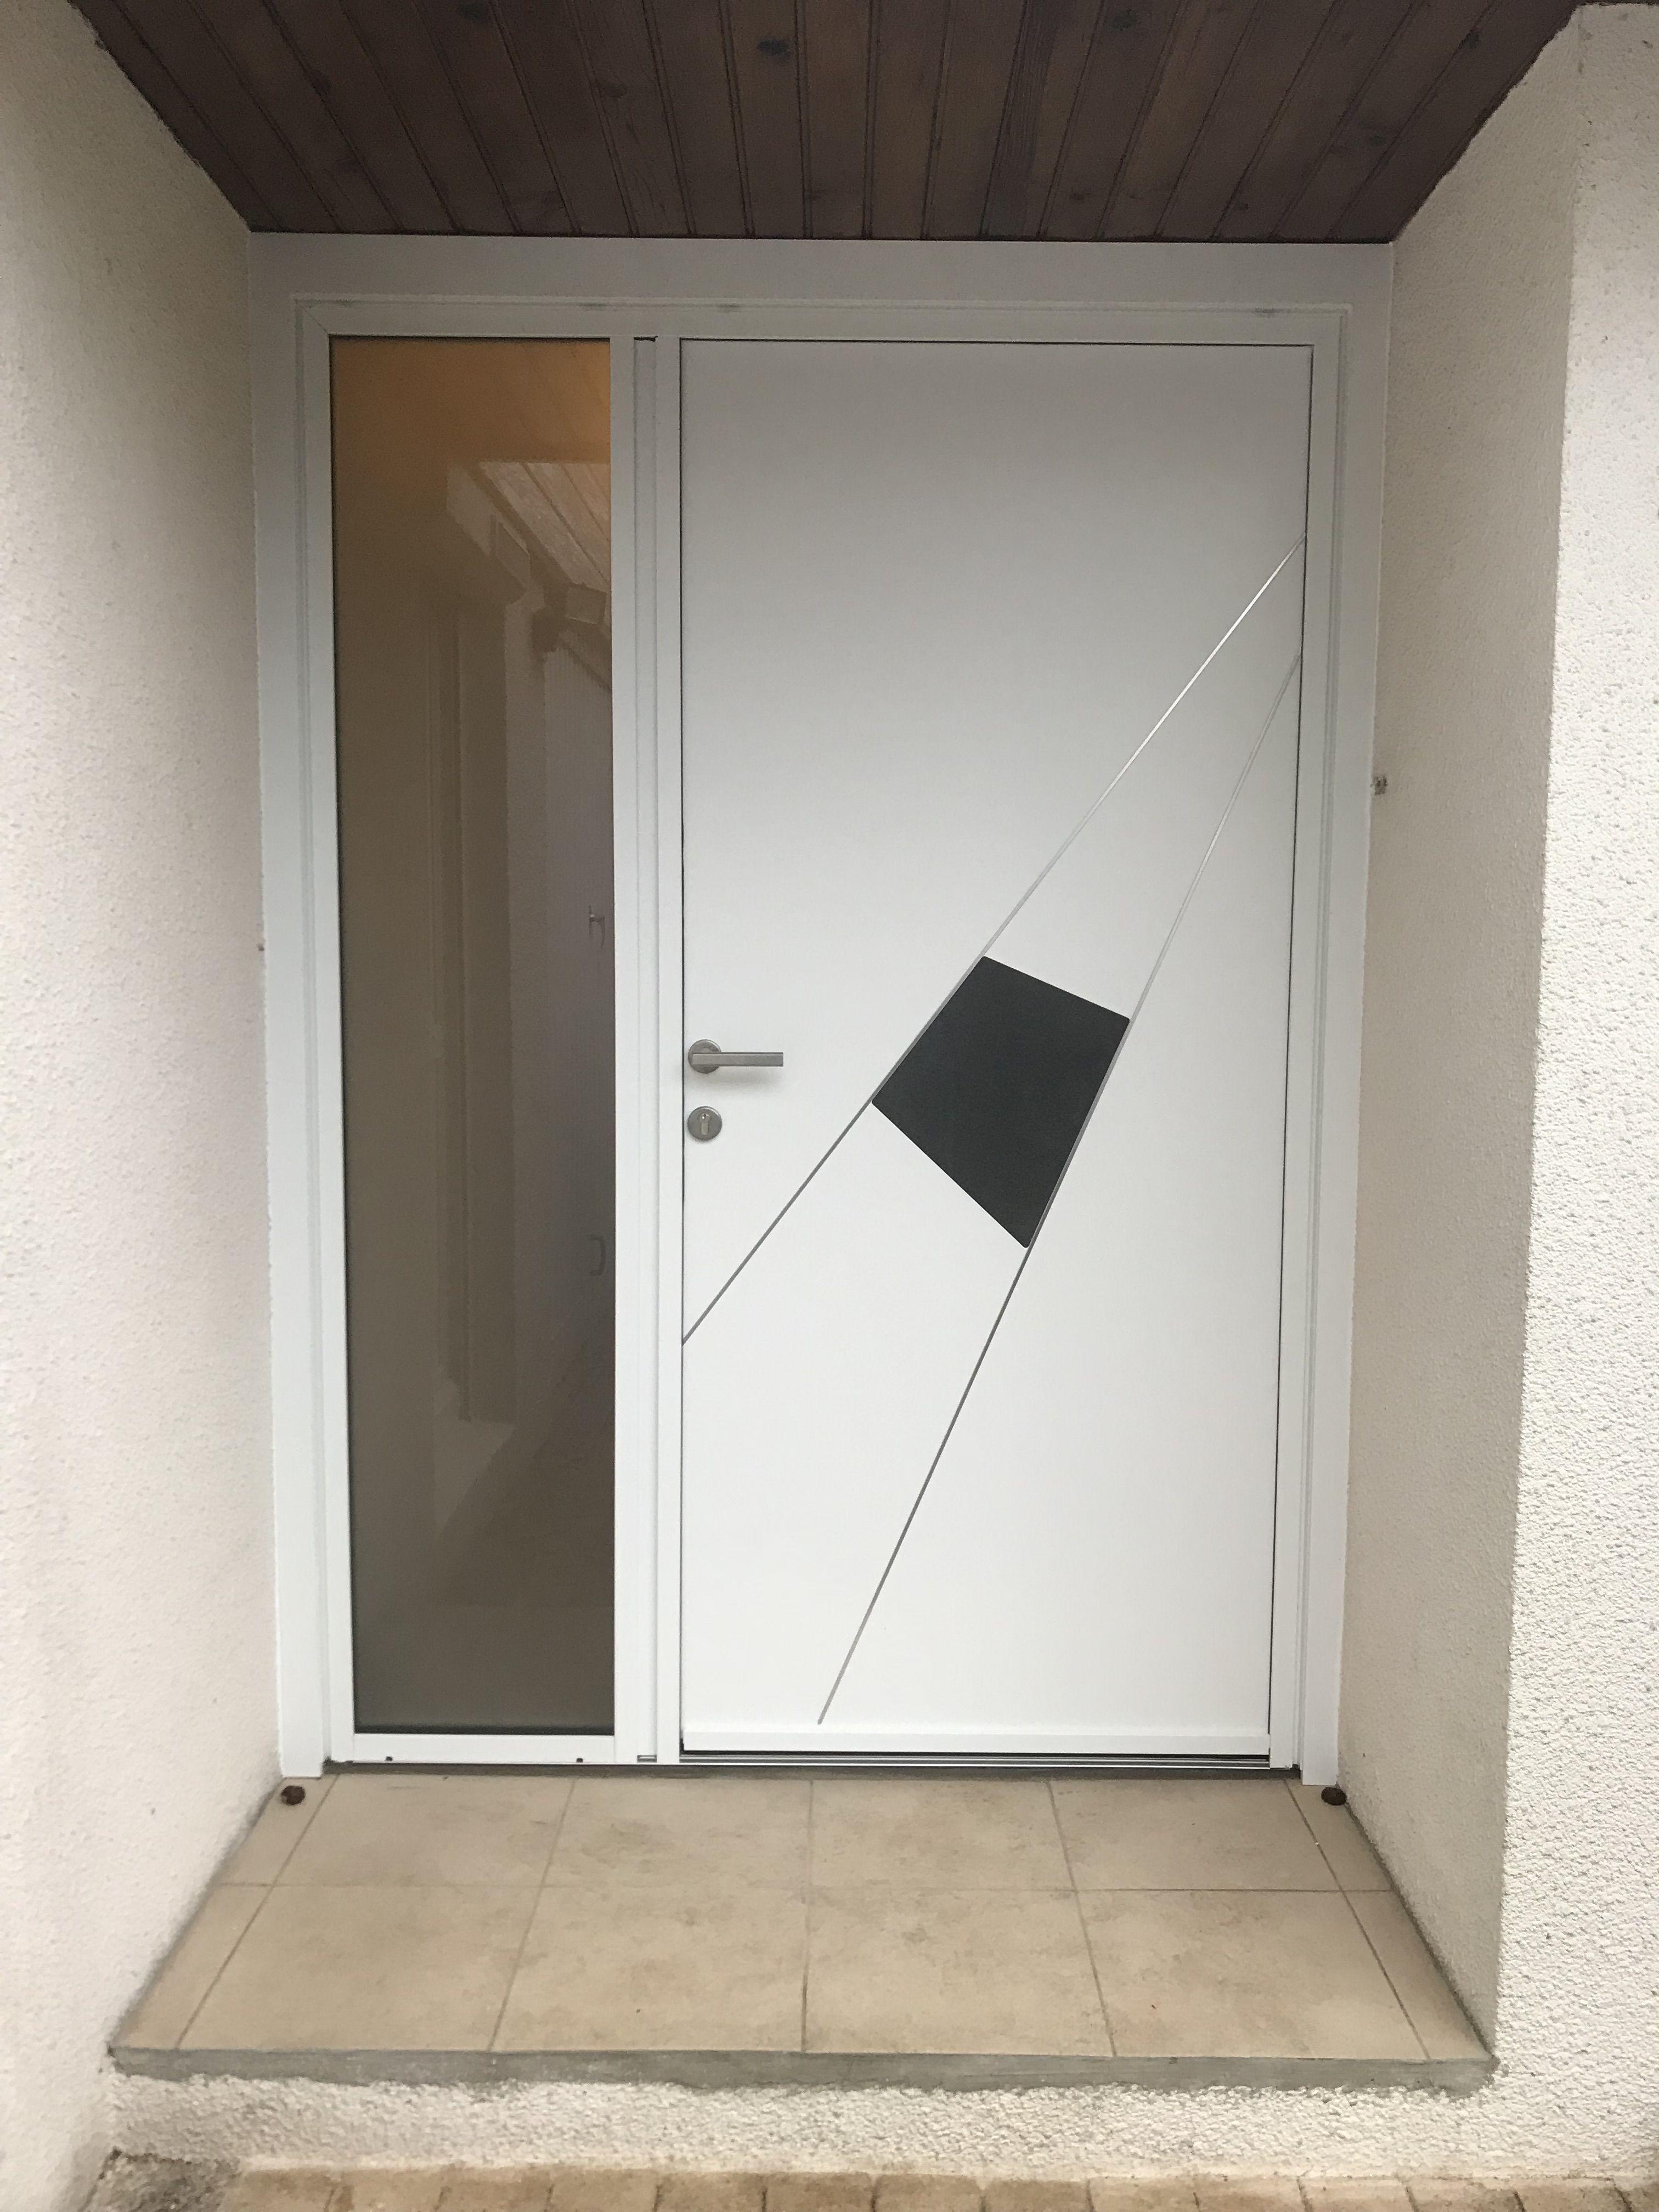 Epingle Par Wilco Sur Porte D Entree Design Aluminium Porte